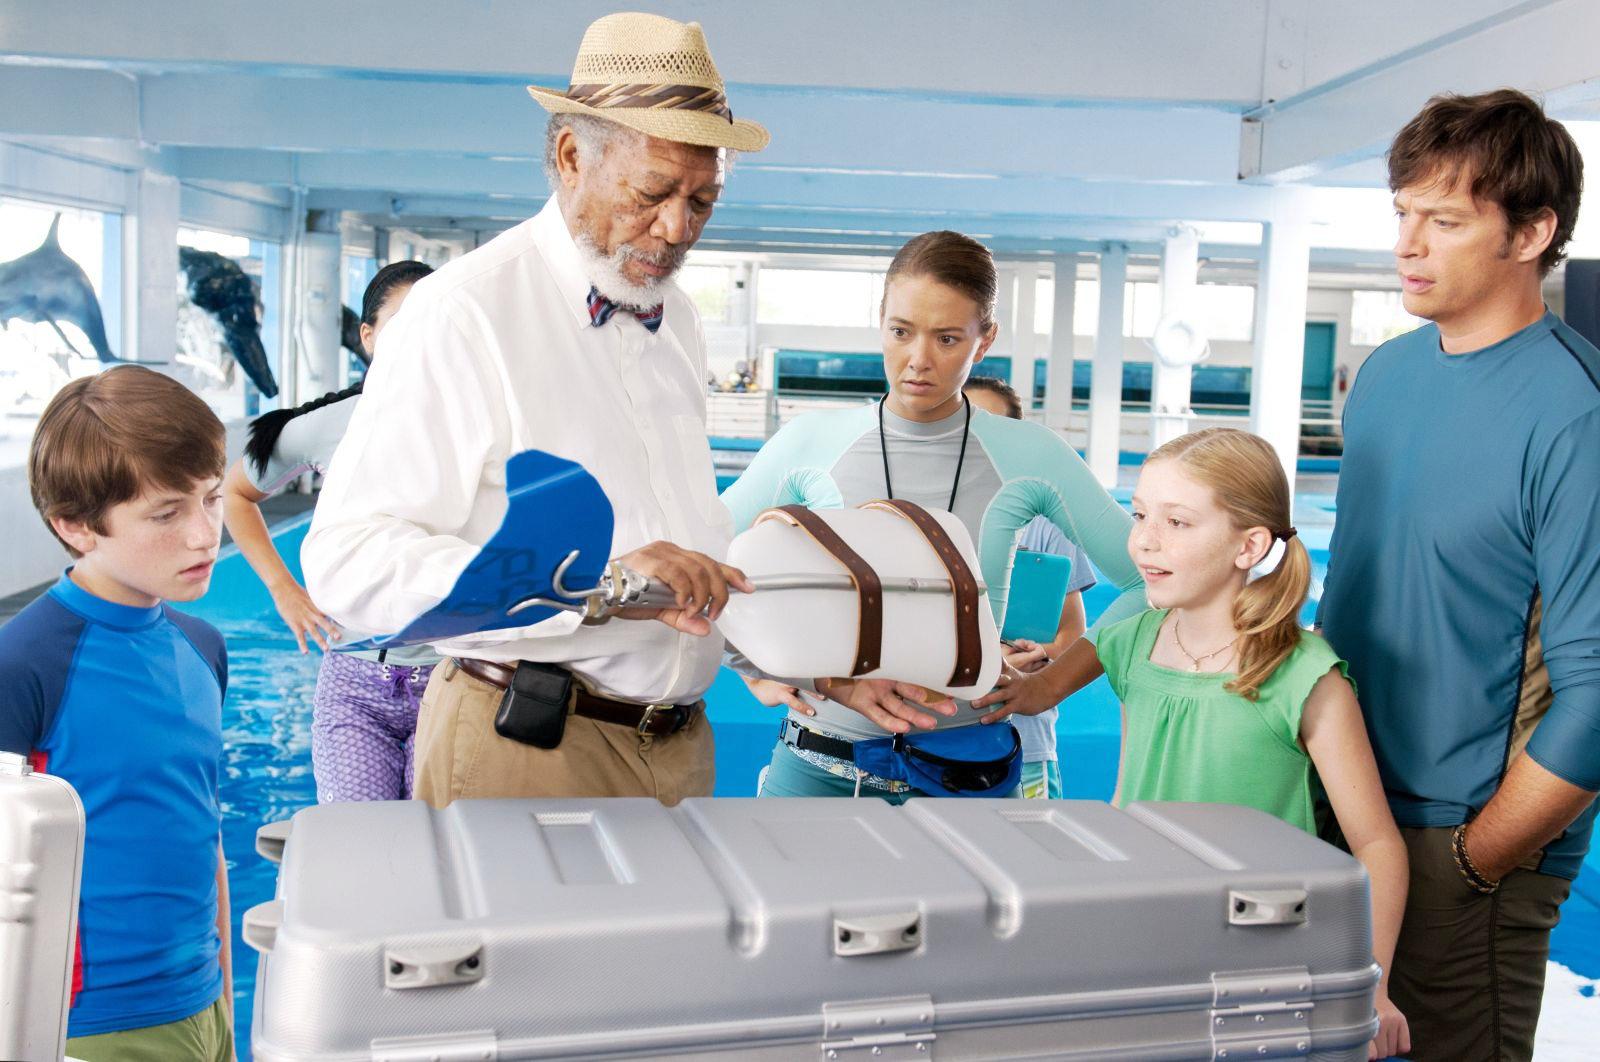 http://2.bp.blogspot.com/-CE5W8jb3UoU/Tk5KfiXvFJI/AAAAAAAABdc/jFV-gPT62vg/s1600/dolphin-tale-movie-2011-9.jpg